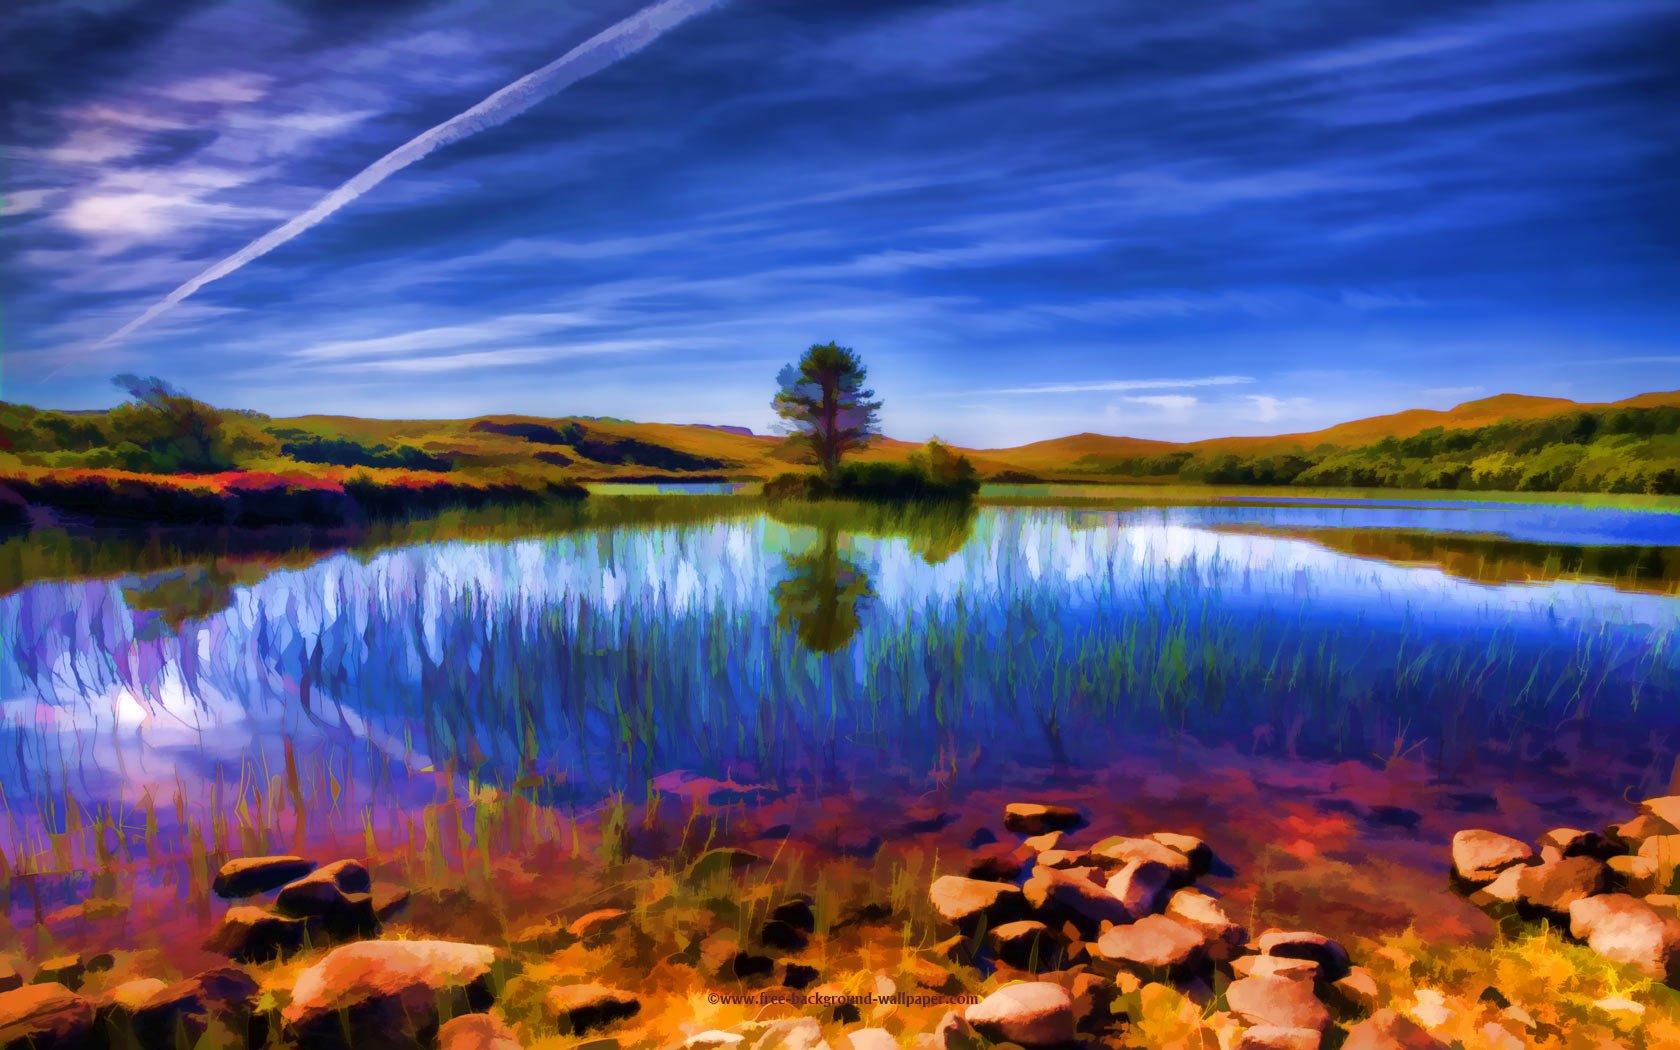 45 Beautiful Widescreen Wallpapers: Beautiful Summer Scenery Wallpaper